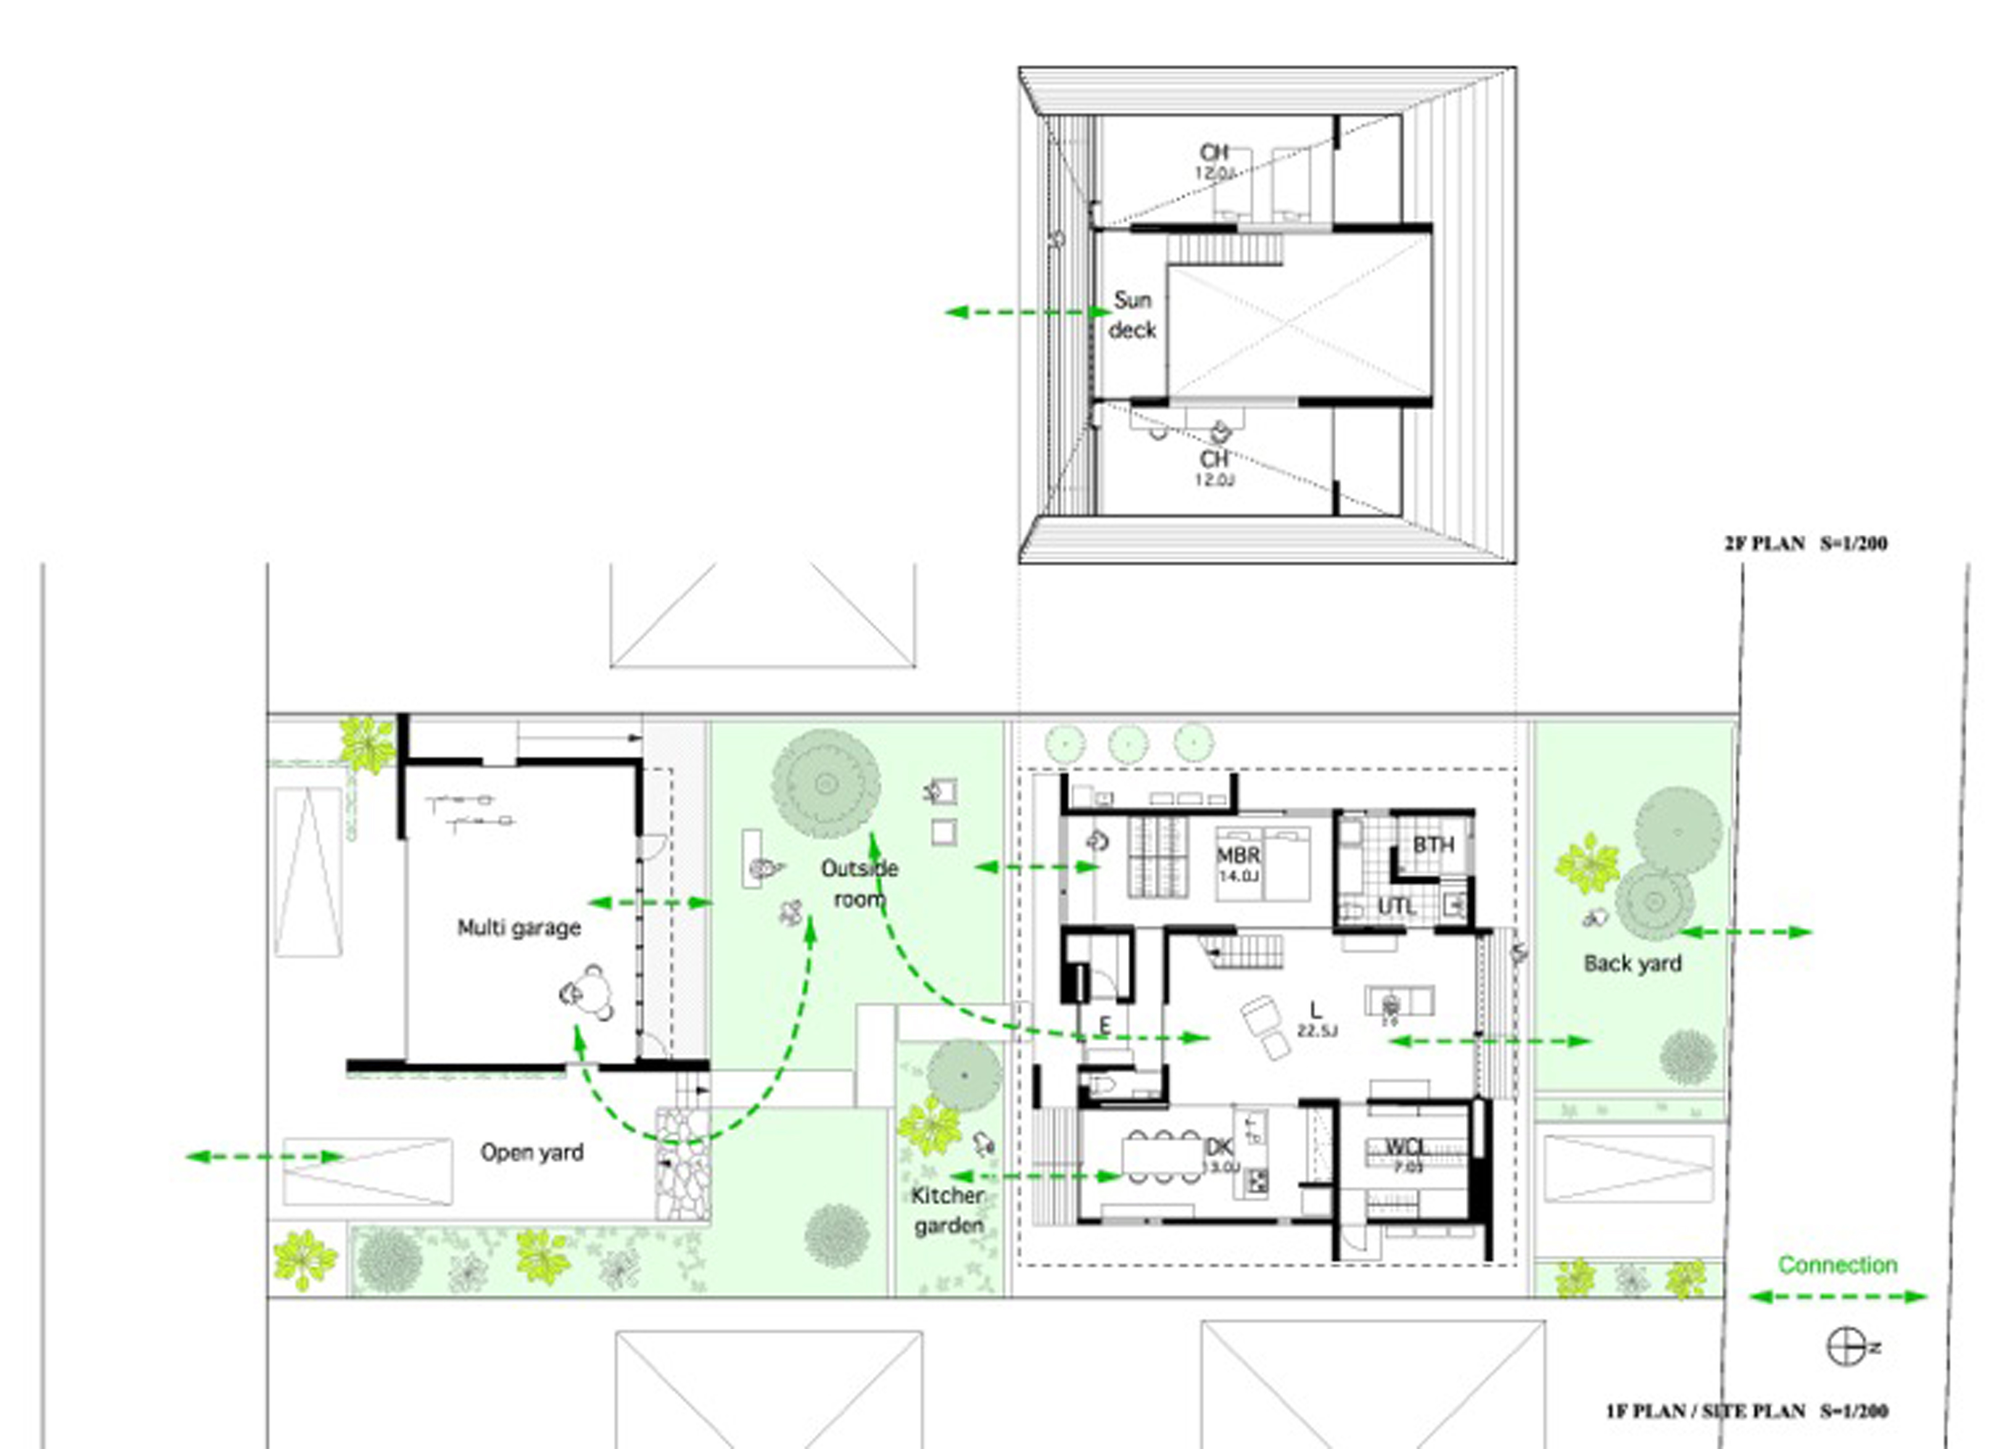 52eb20e6e8e44e981a0000a8_house-with-a-large-hipped-roof-naoi-architecture-design-office_floor_plan